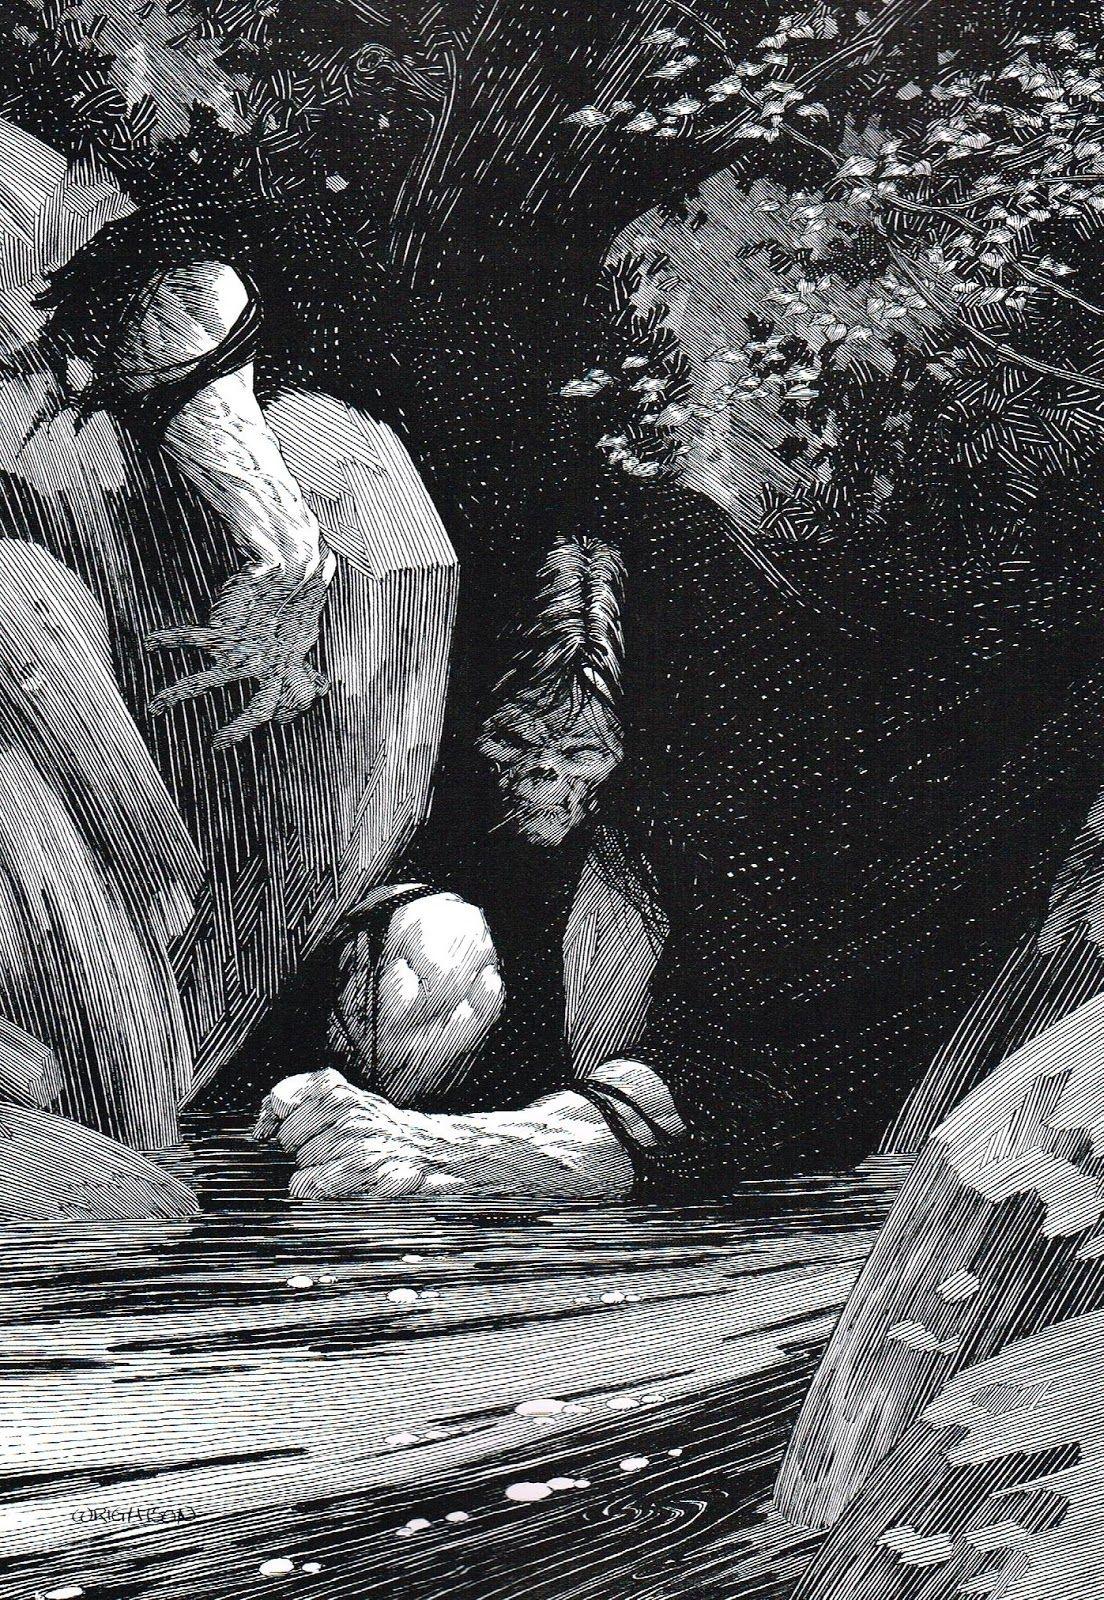 Frankensteins Monster From Mary Shelleys Frankenstein Illustrated By Bernie Wrightson